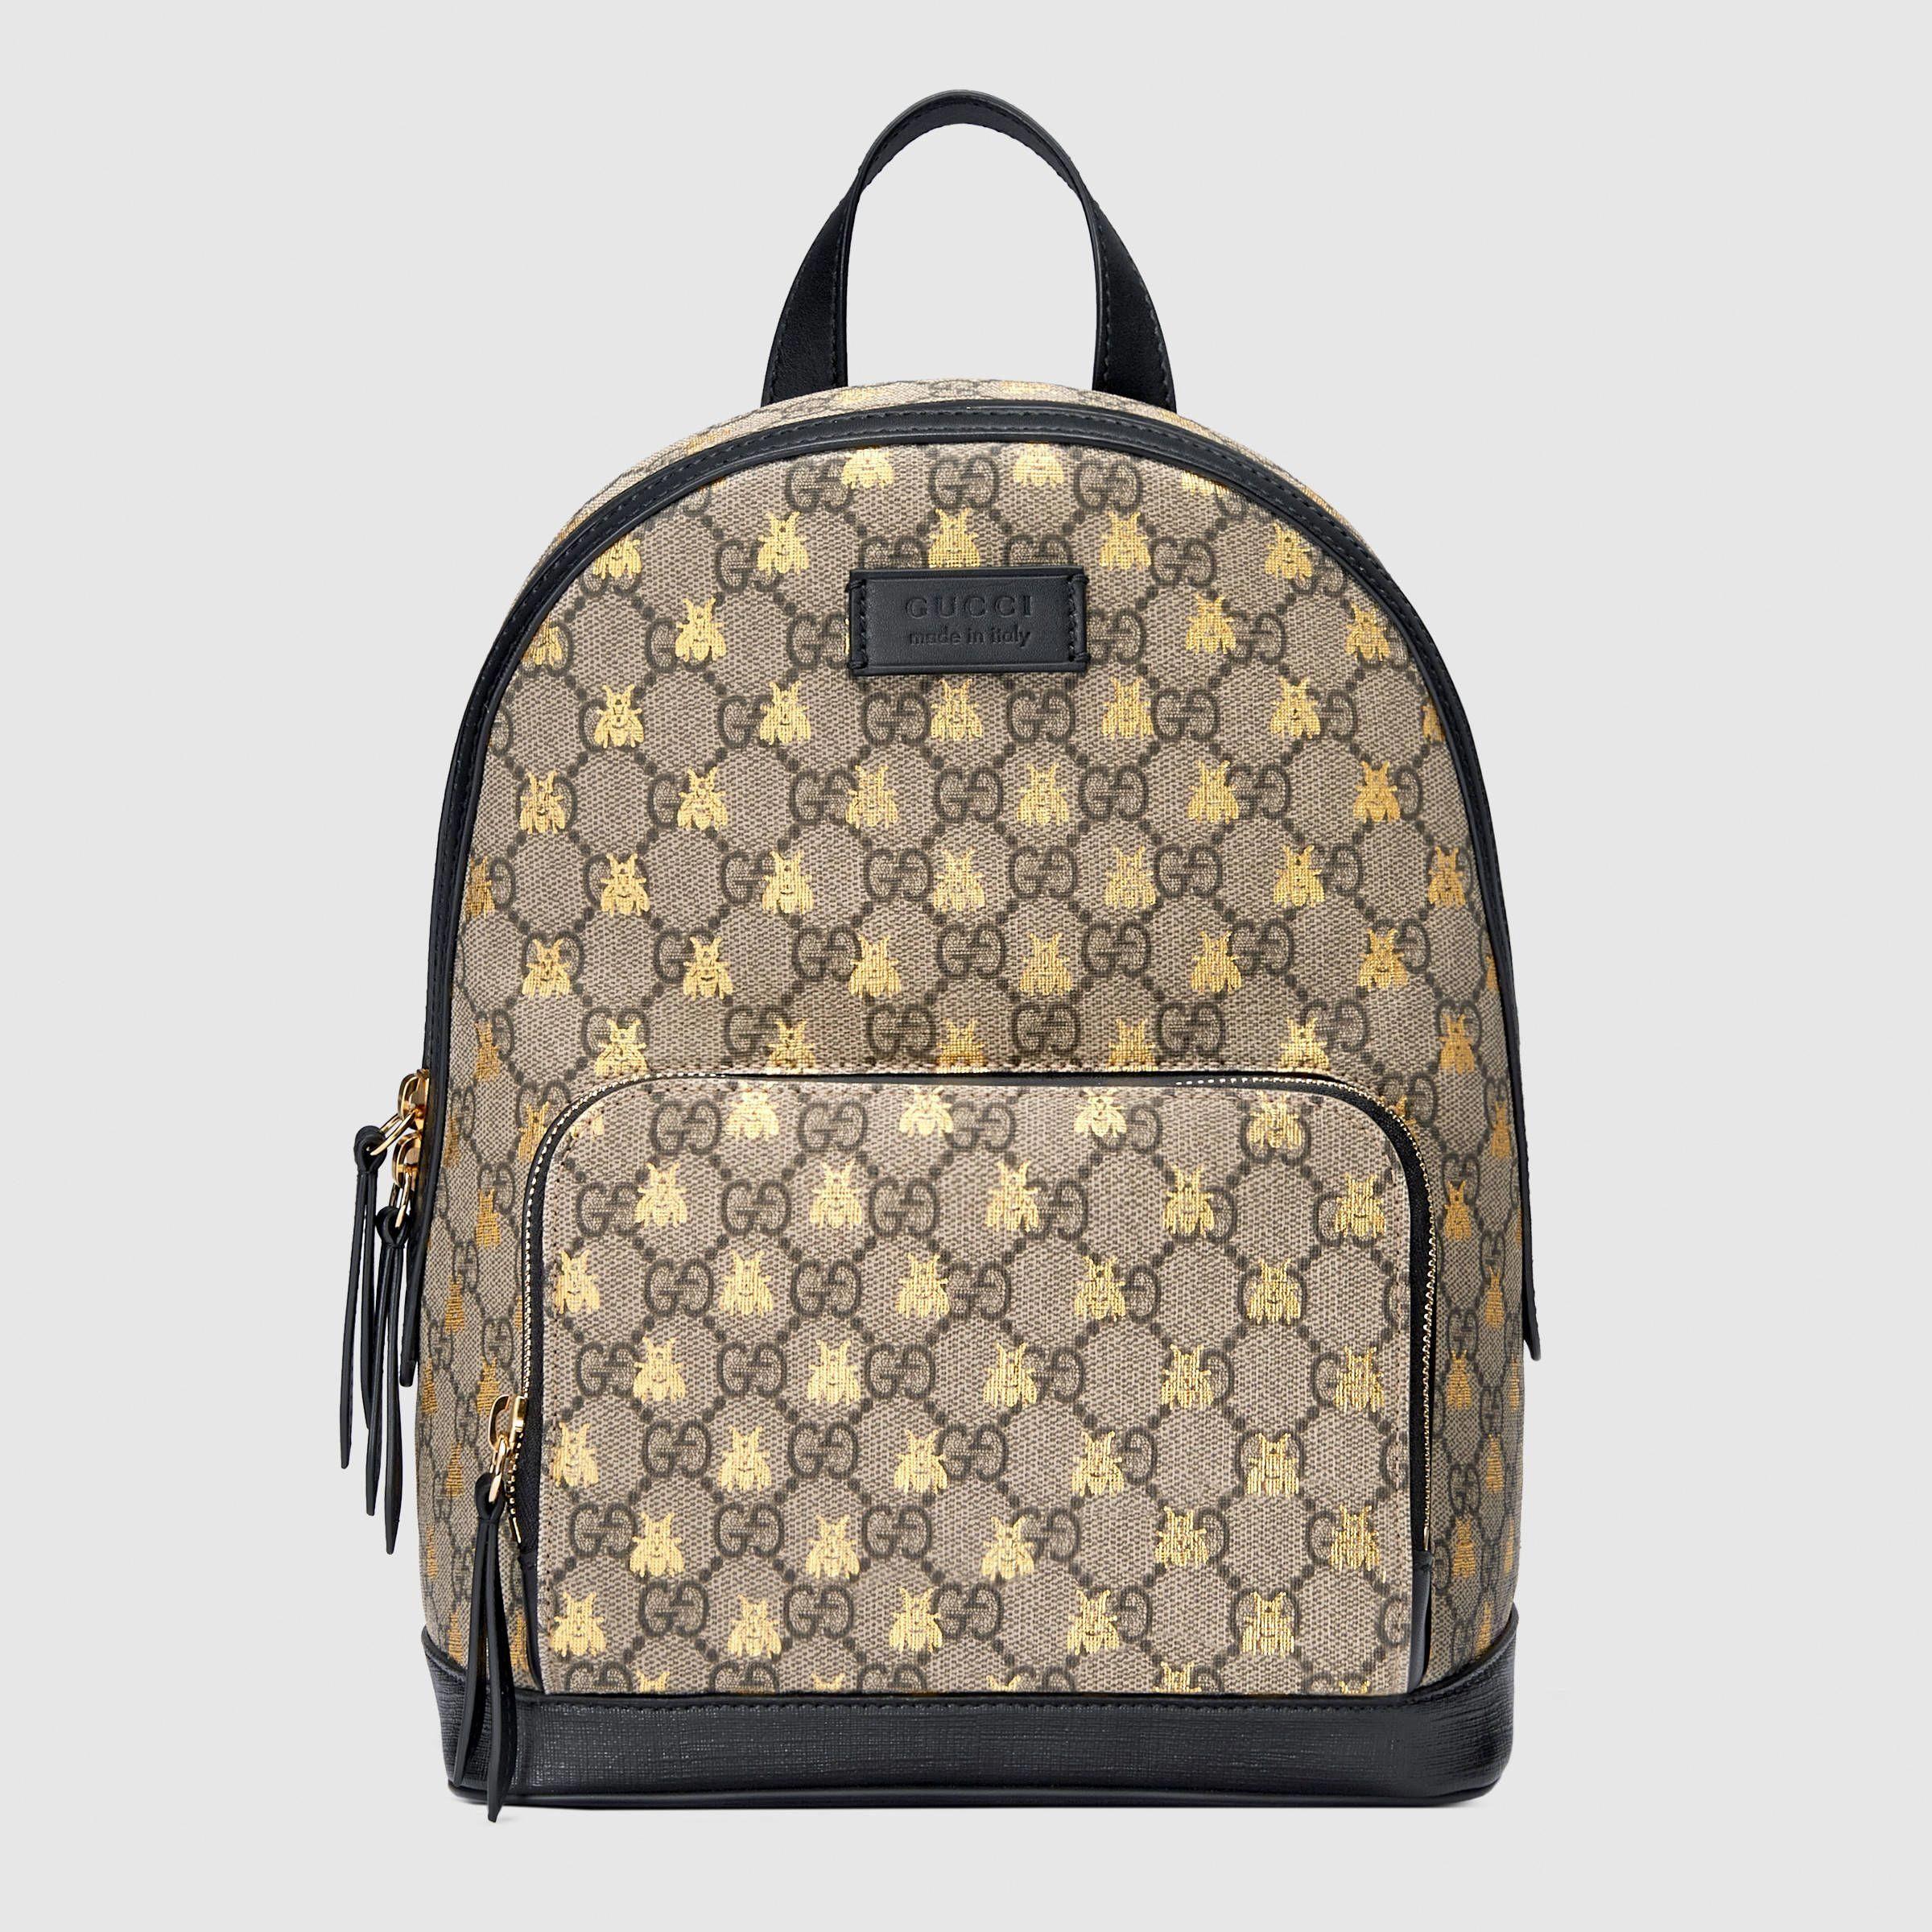 2b9246792fe4 GG Supreme bees backpack  Guccihandbags